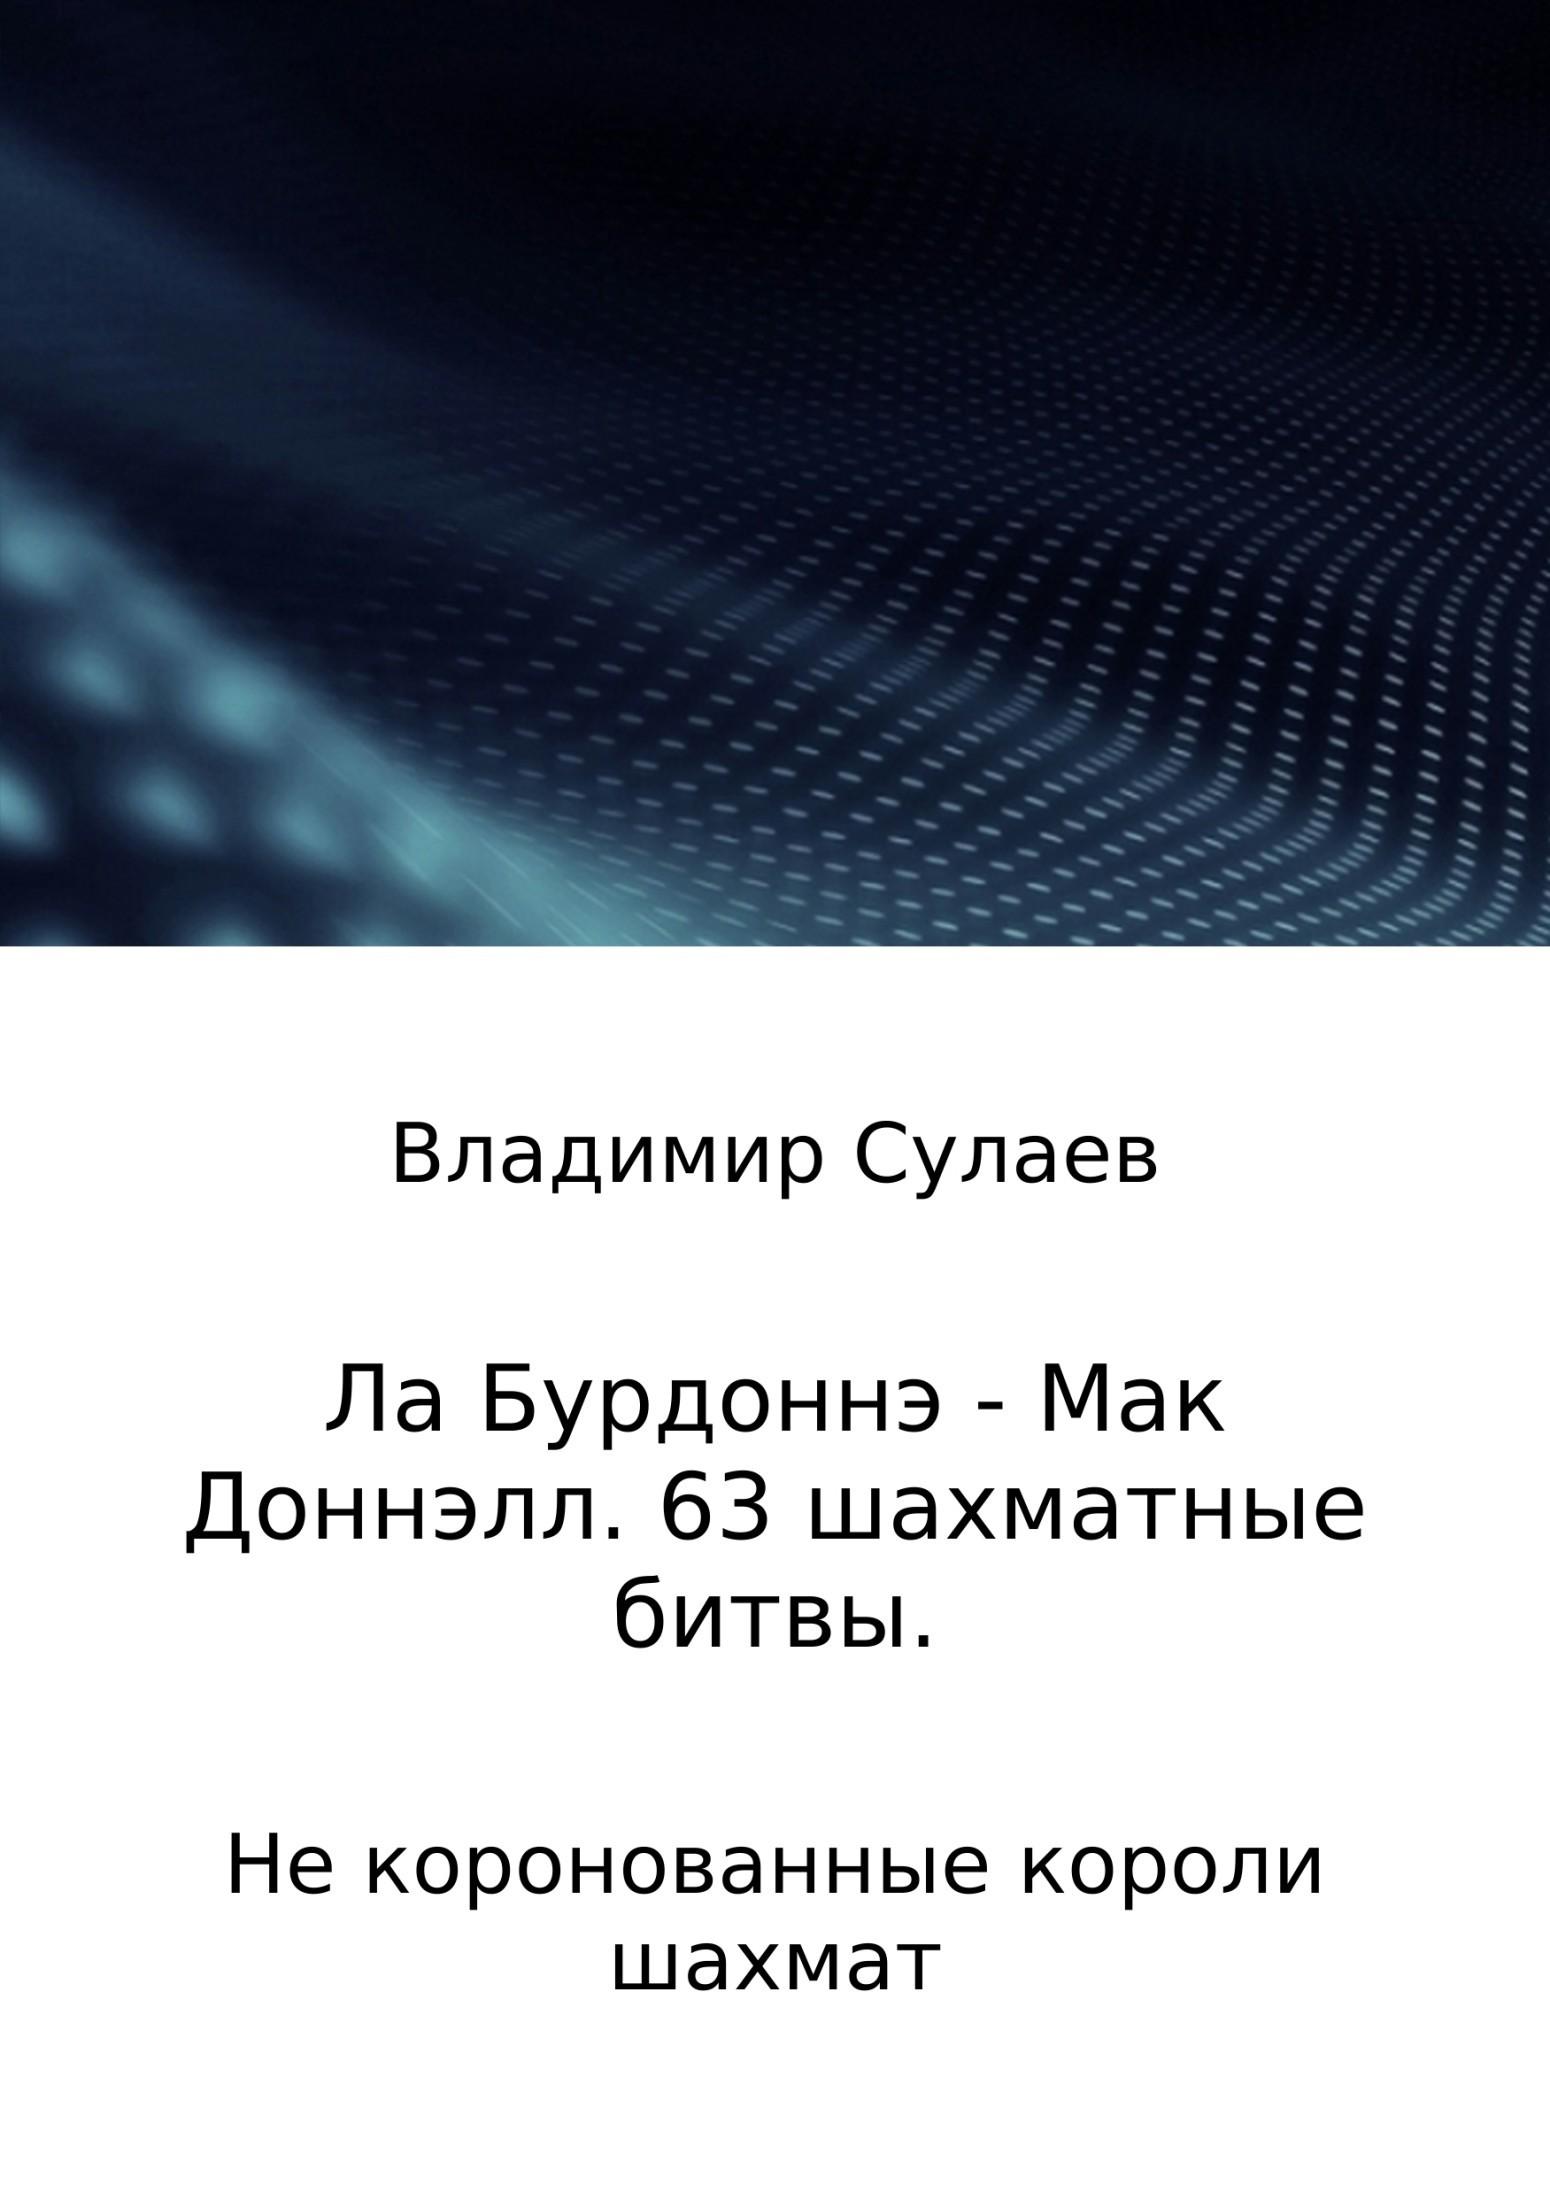 Владимир Валерьевич Сулаев Ла Бурдоннэ – Мак Доннэлл. 63 шахматные битвы цены